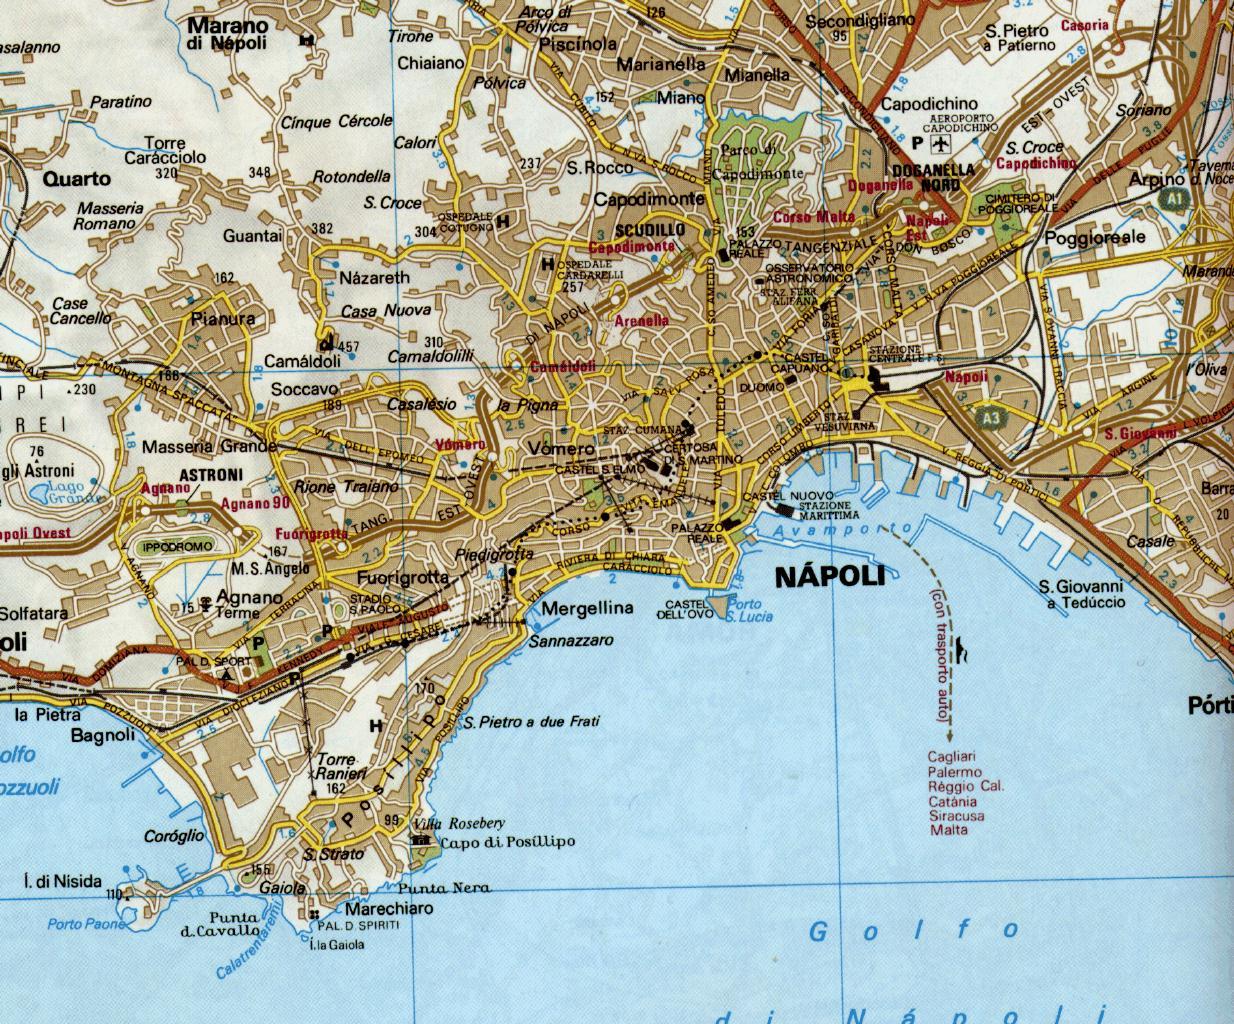 Cartina Fisica Napoli.Dove Siamo Italycenter Naples Italy